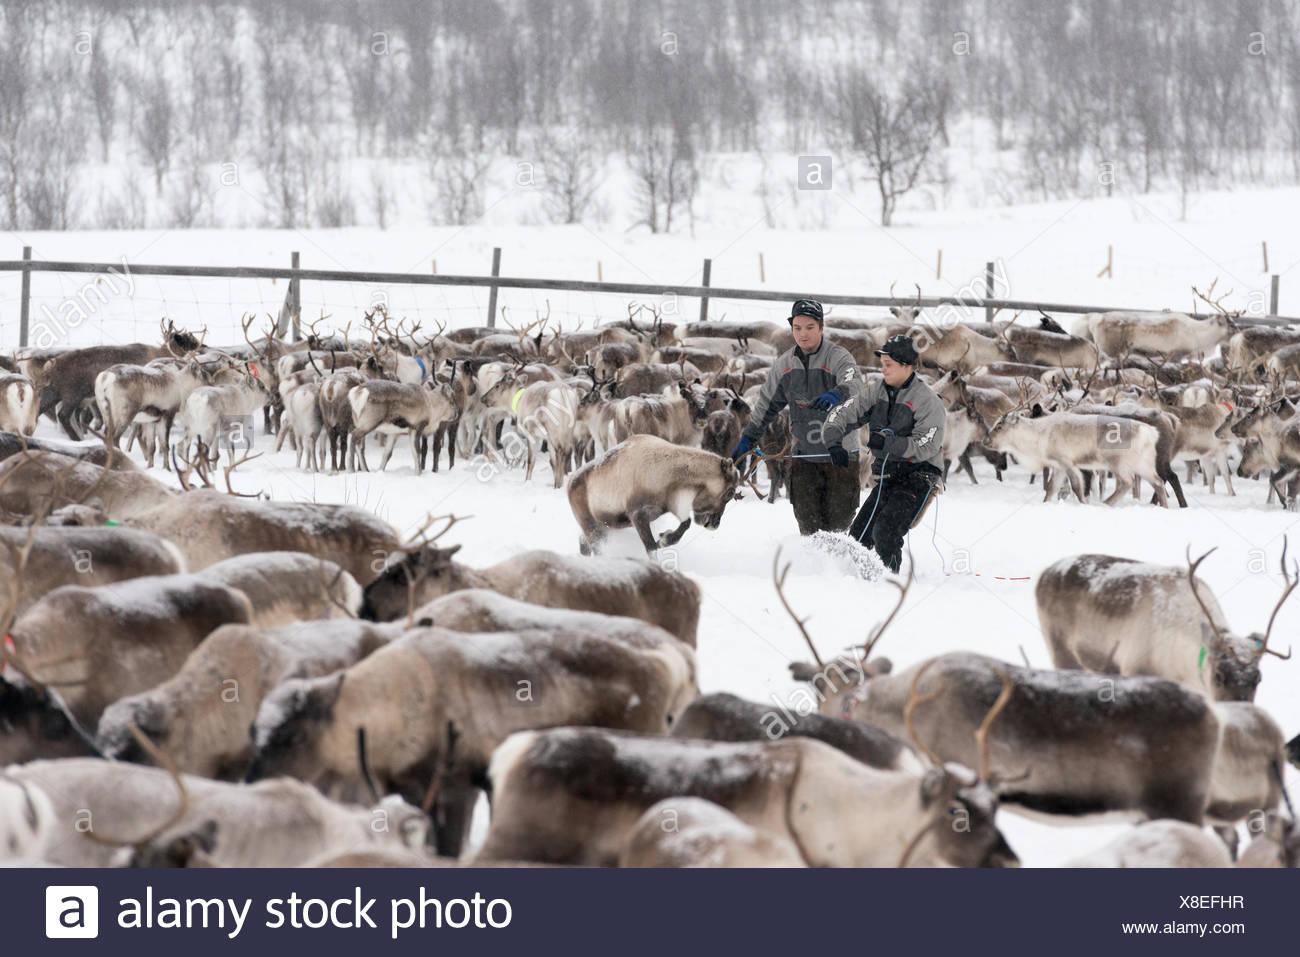 Sami reindeer herders mark calves in winter. - Stock Image